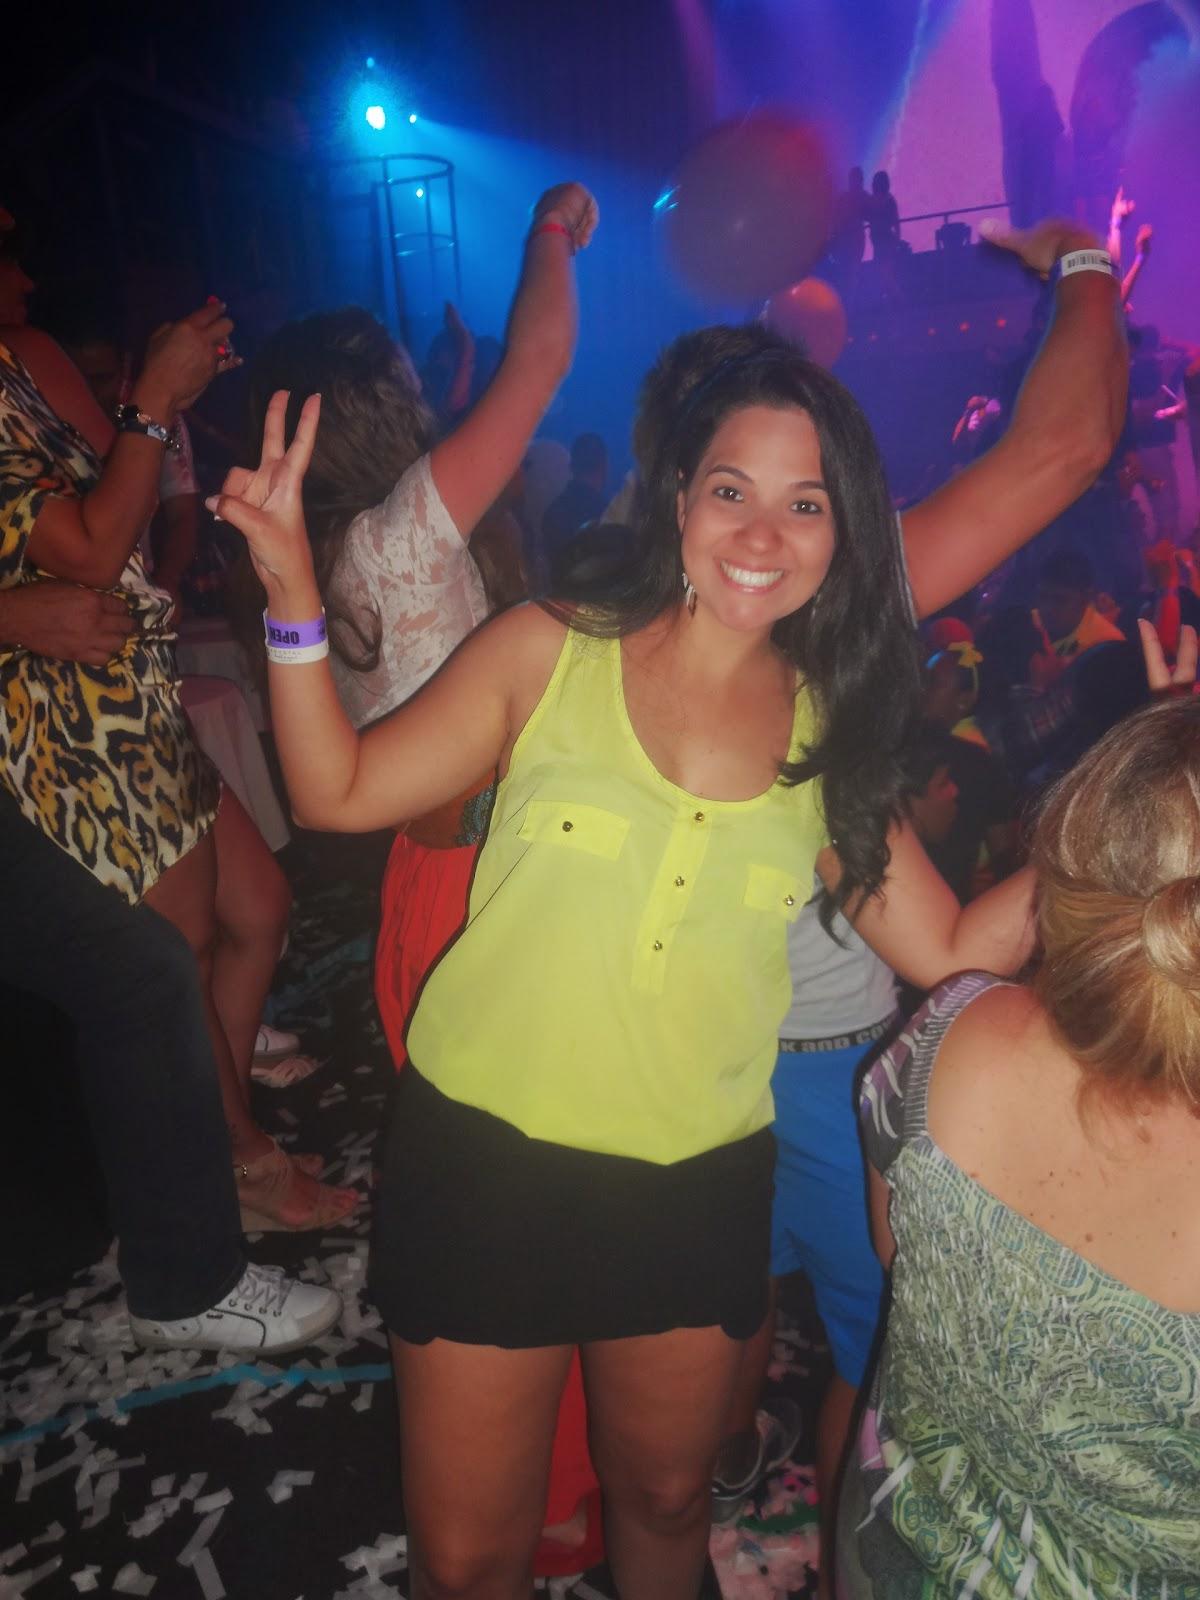 dentro da boate CocoBongo - Cancún